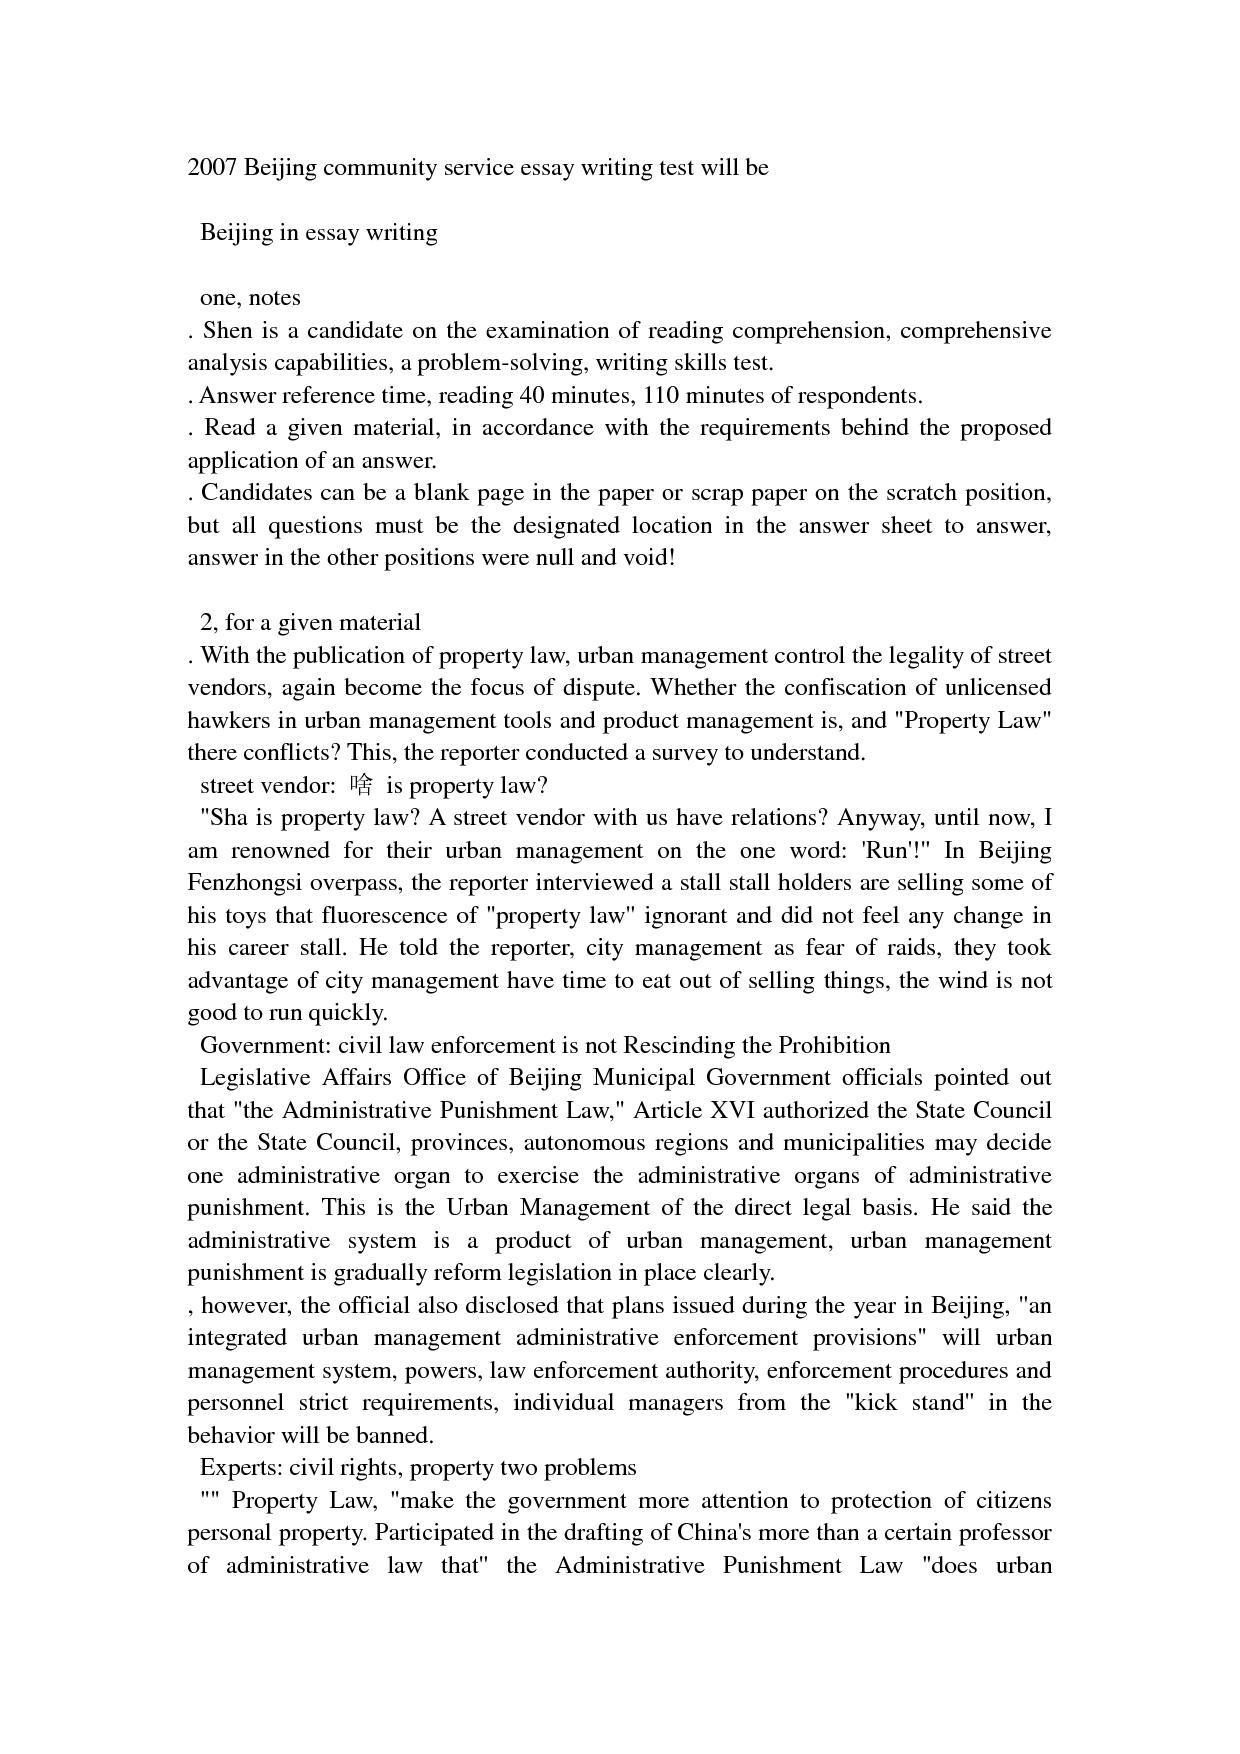 001 Saiefeojnc Essay Example On Community Best Service Persuasive To Graduate Unpaid Synthesis Full